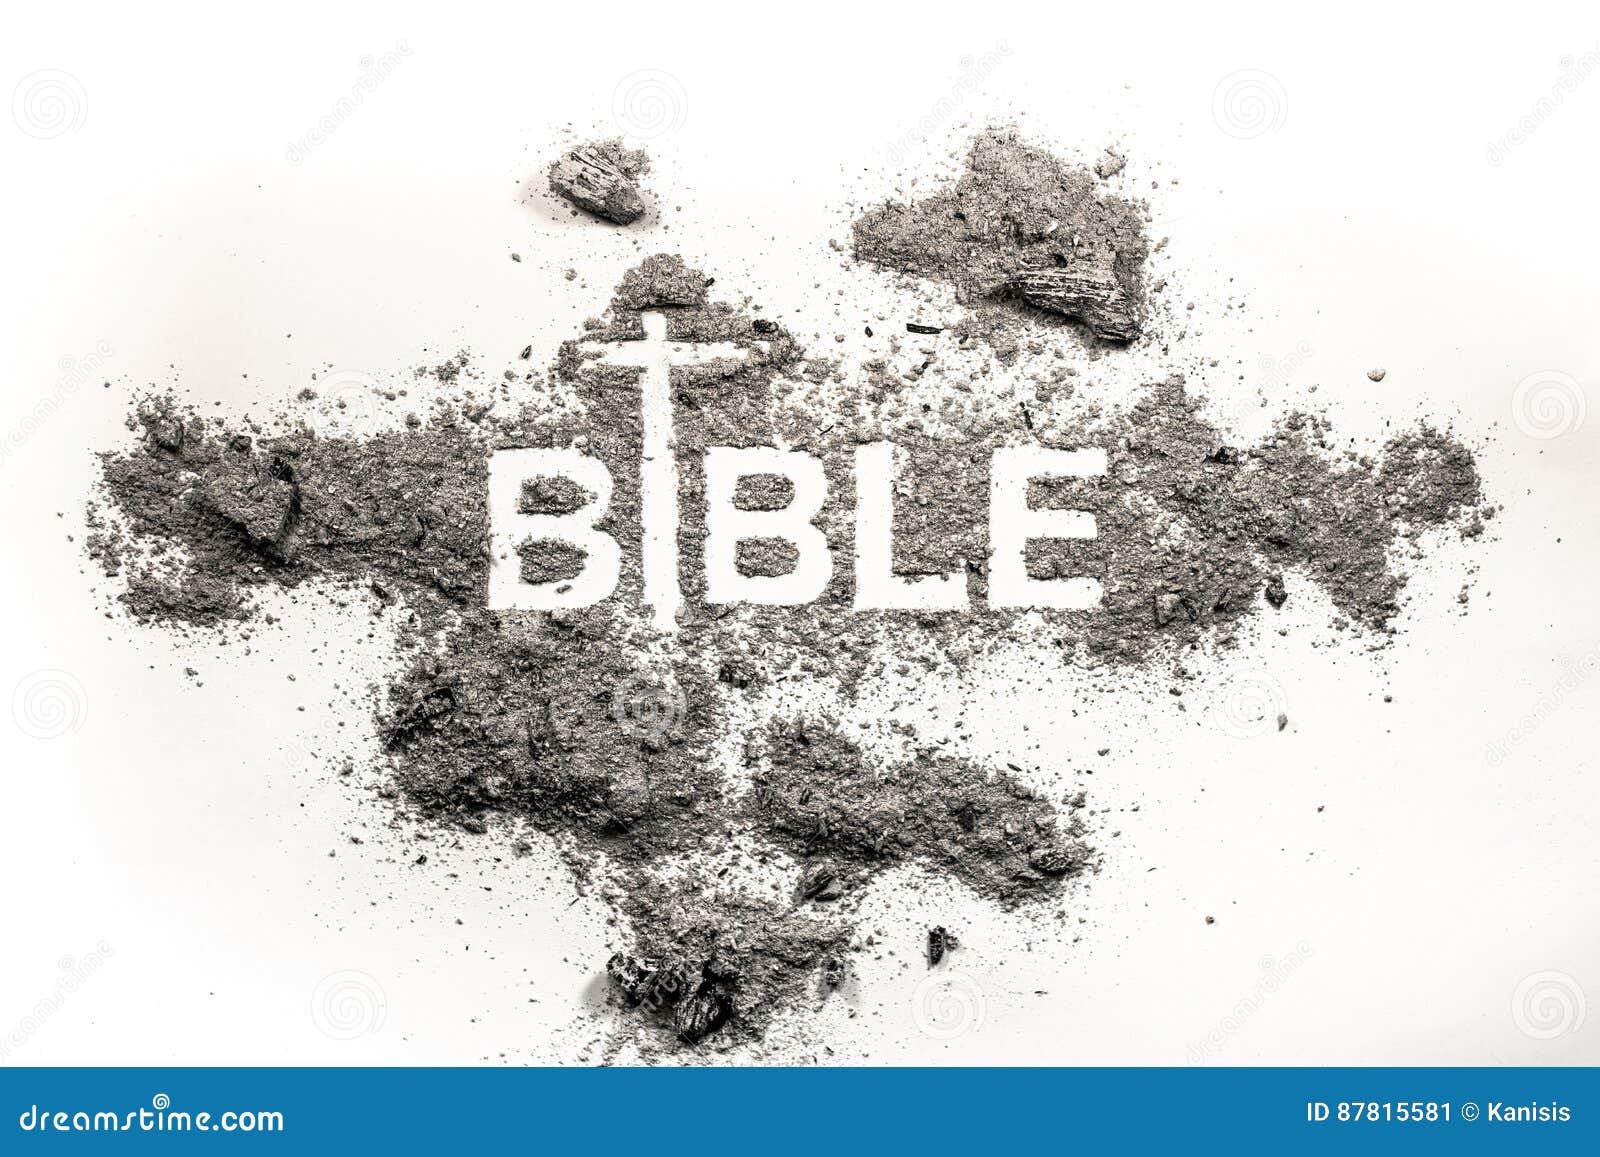 Bijbelwoord In As Stof En Dwarstekening Als Godsdienst A Wordt